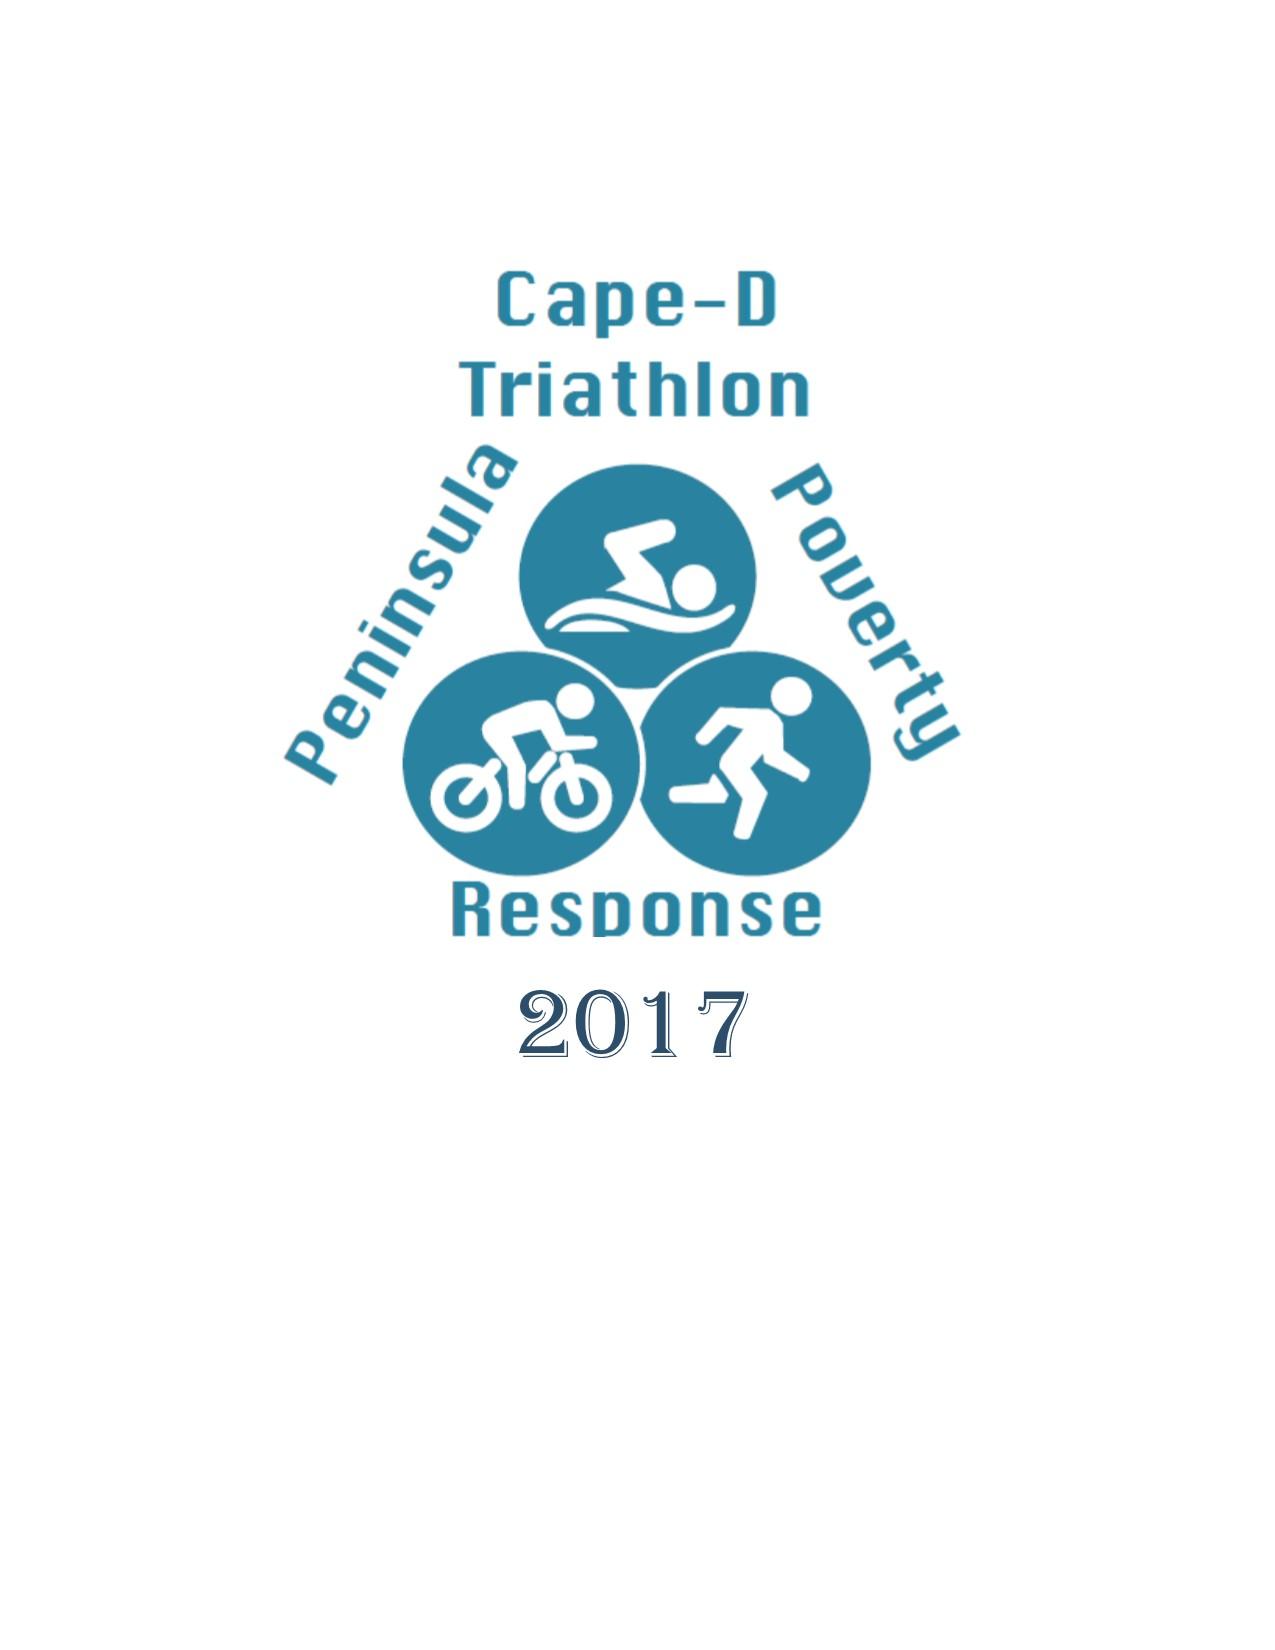 PPR Cape. D. Tri Logo 2017